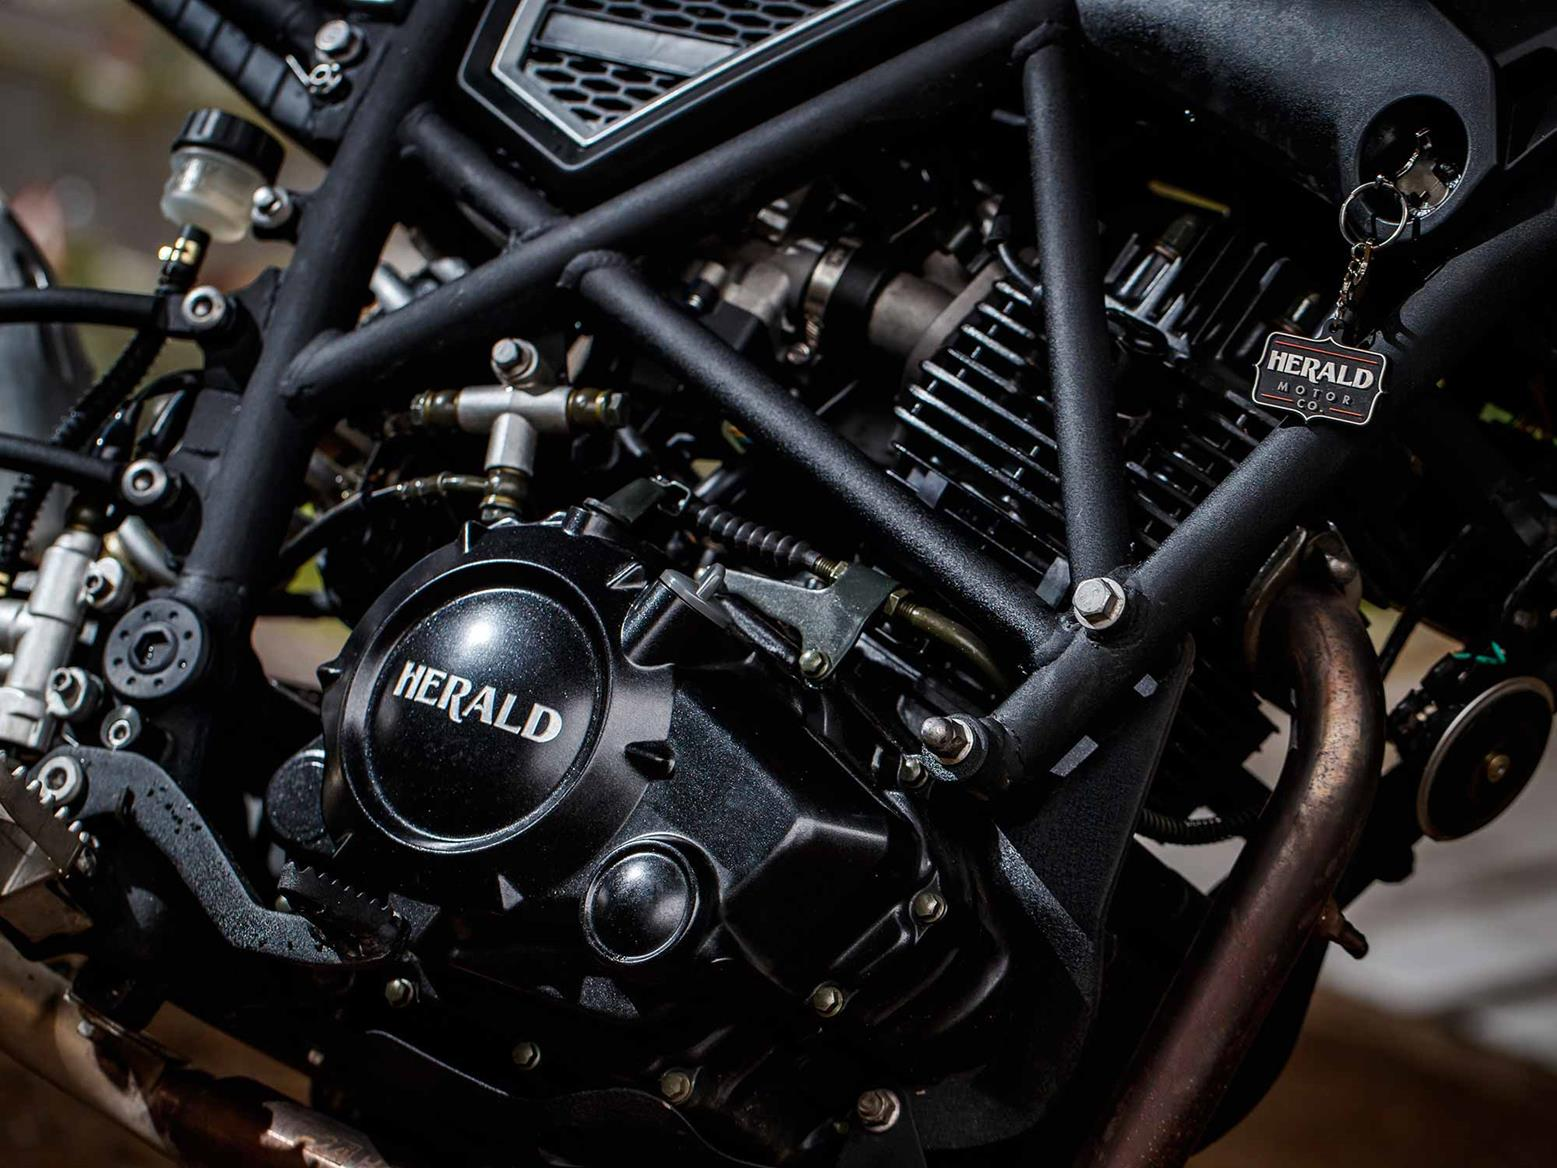 The Herald Brat 125 engine